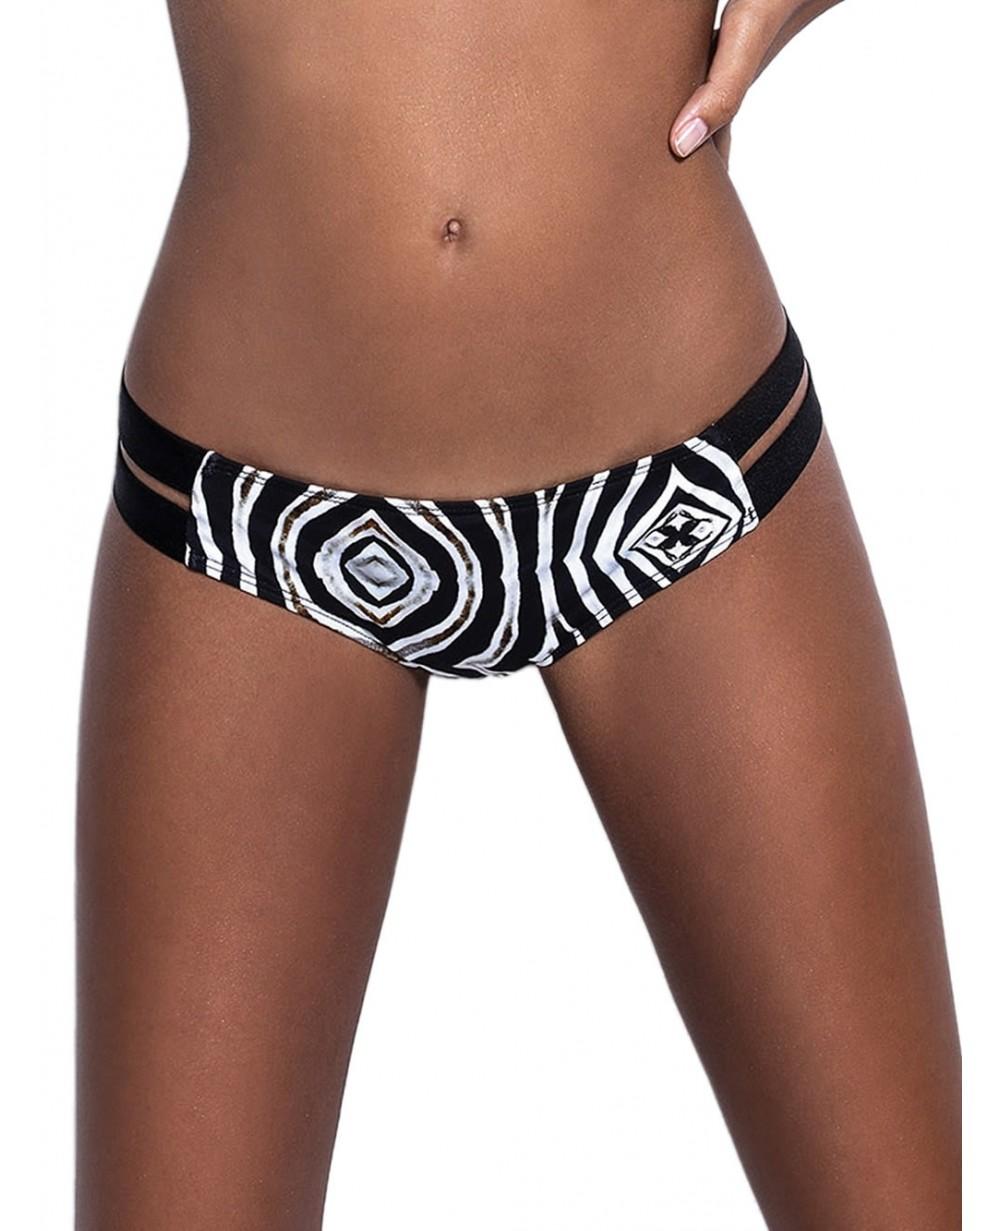 d2ed4289af4 Μαγιό BLUEPOINT Zebra Bikini Κανονικό - Λωρίδες Ανοίγματα ...